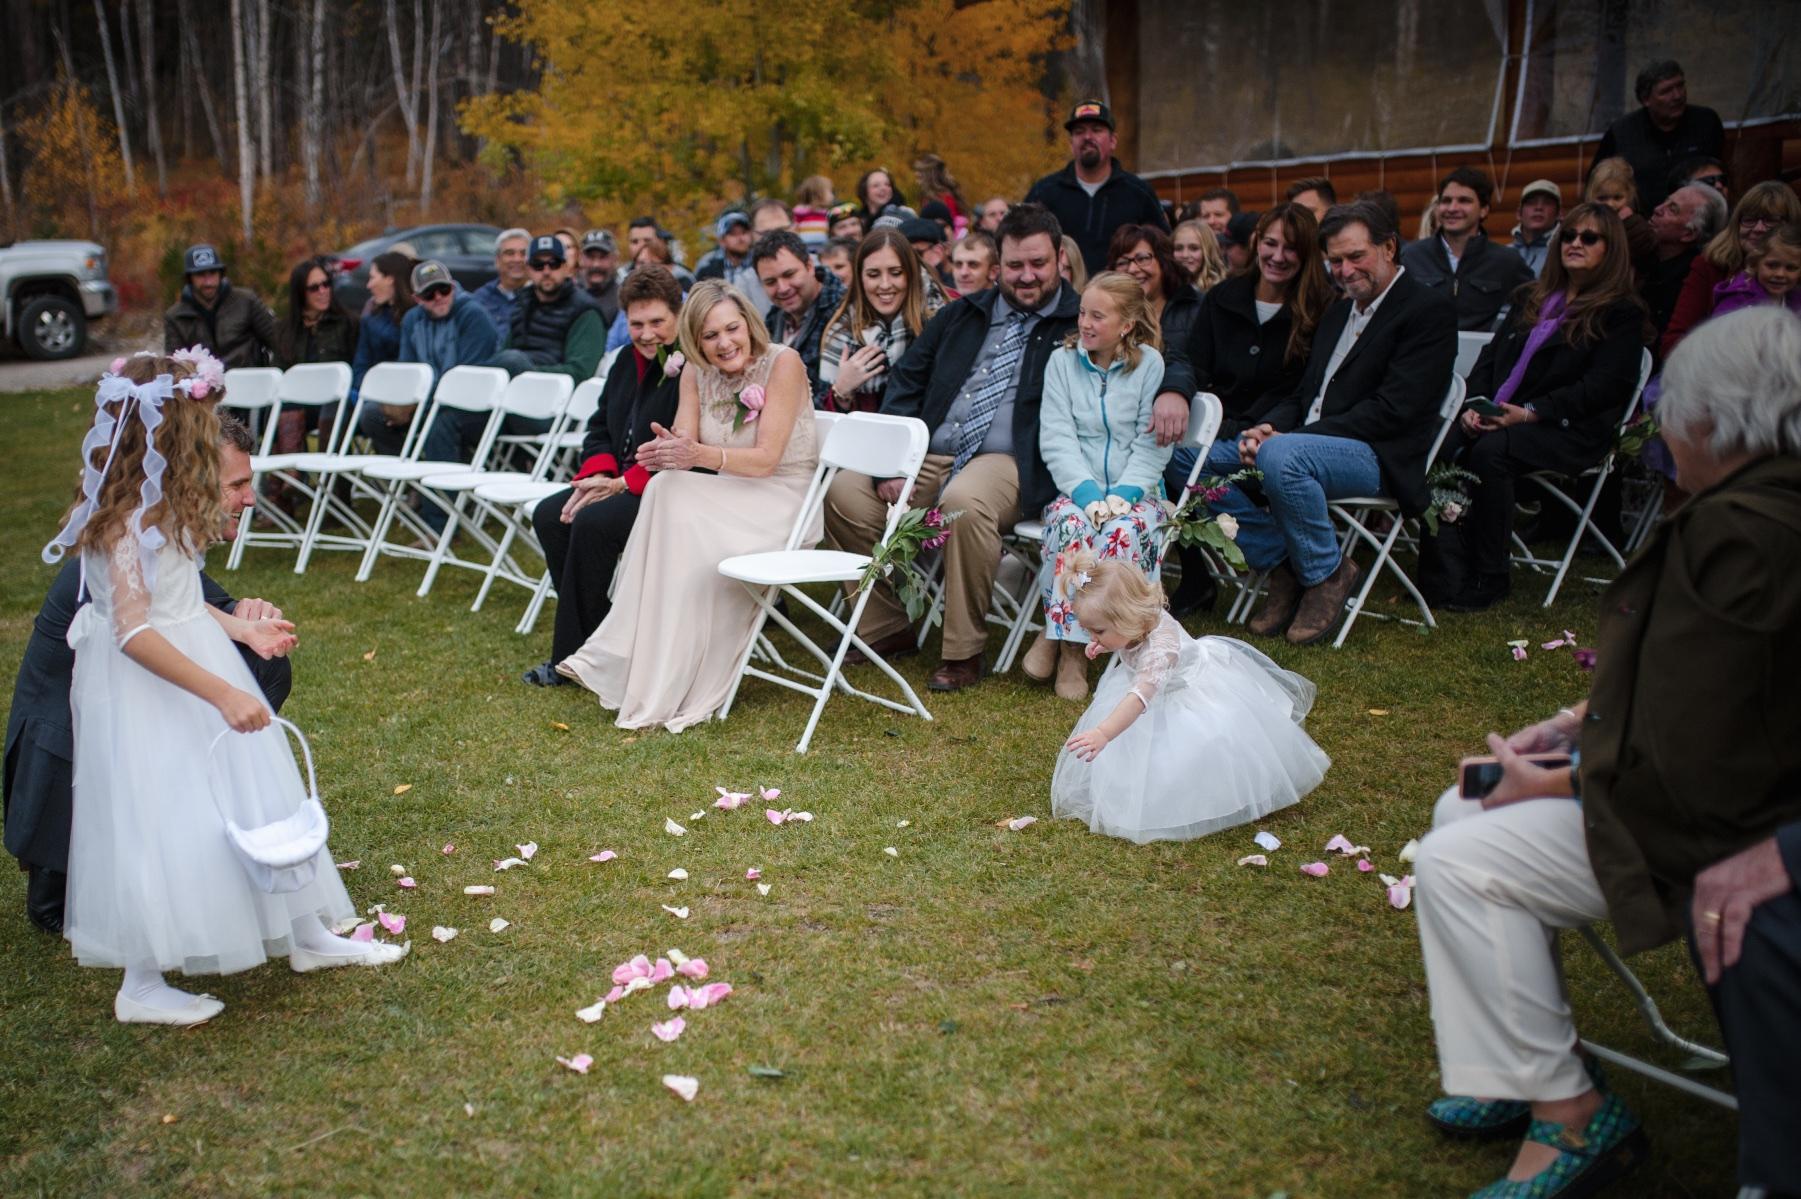 lindseyjane_wedding047.jpg